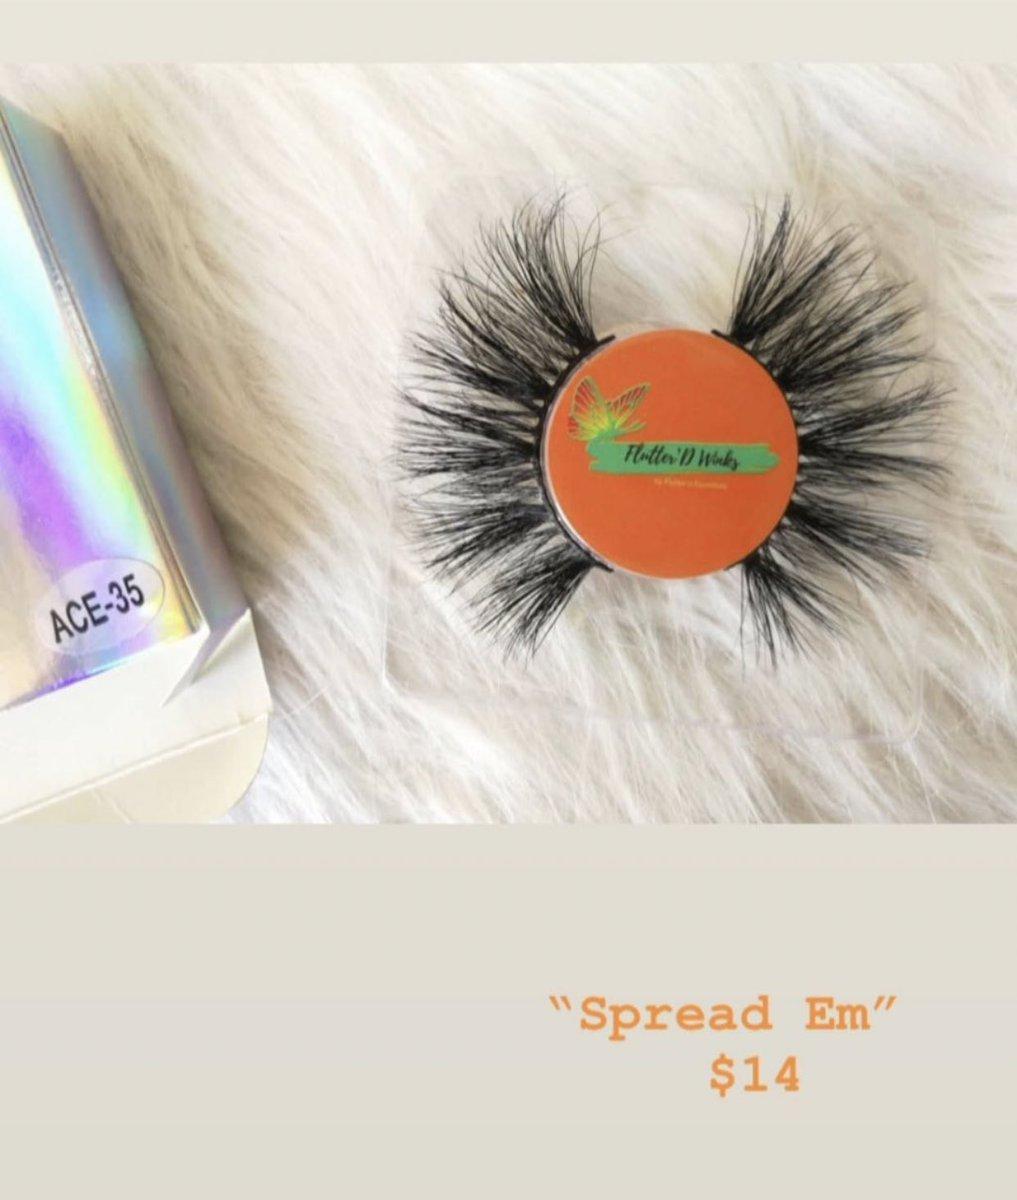 """Spread Em"" $14 COME SHOP LADIES Link To WEBSITE in BIO  CONTACT US  flutterd.essentials@gmail.com #lashbabes #minkeyelashstrips #dmvlashes #girlboss #makeup #girlboss #dmvmakeupartist #dmvmakeup #lashes #lashtechnician #minkstriplashes #makeupbrushes #comeshoppic.twitter.com/tm206sLvX1"